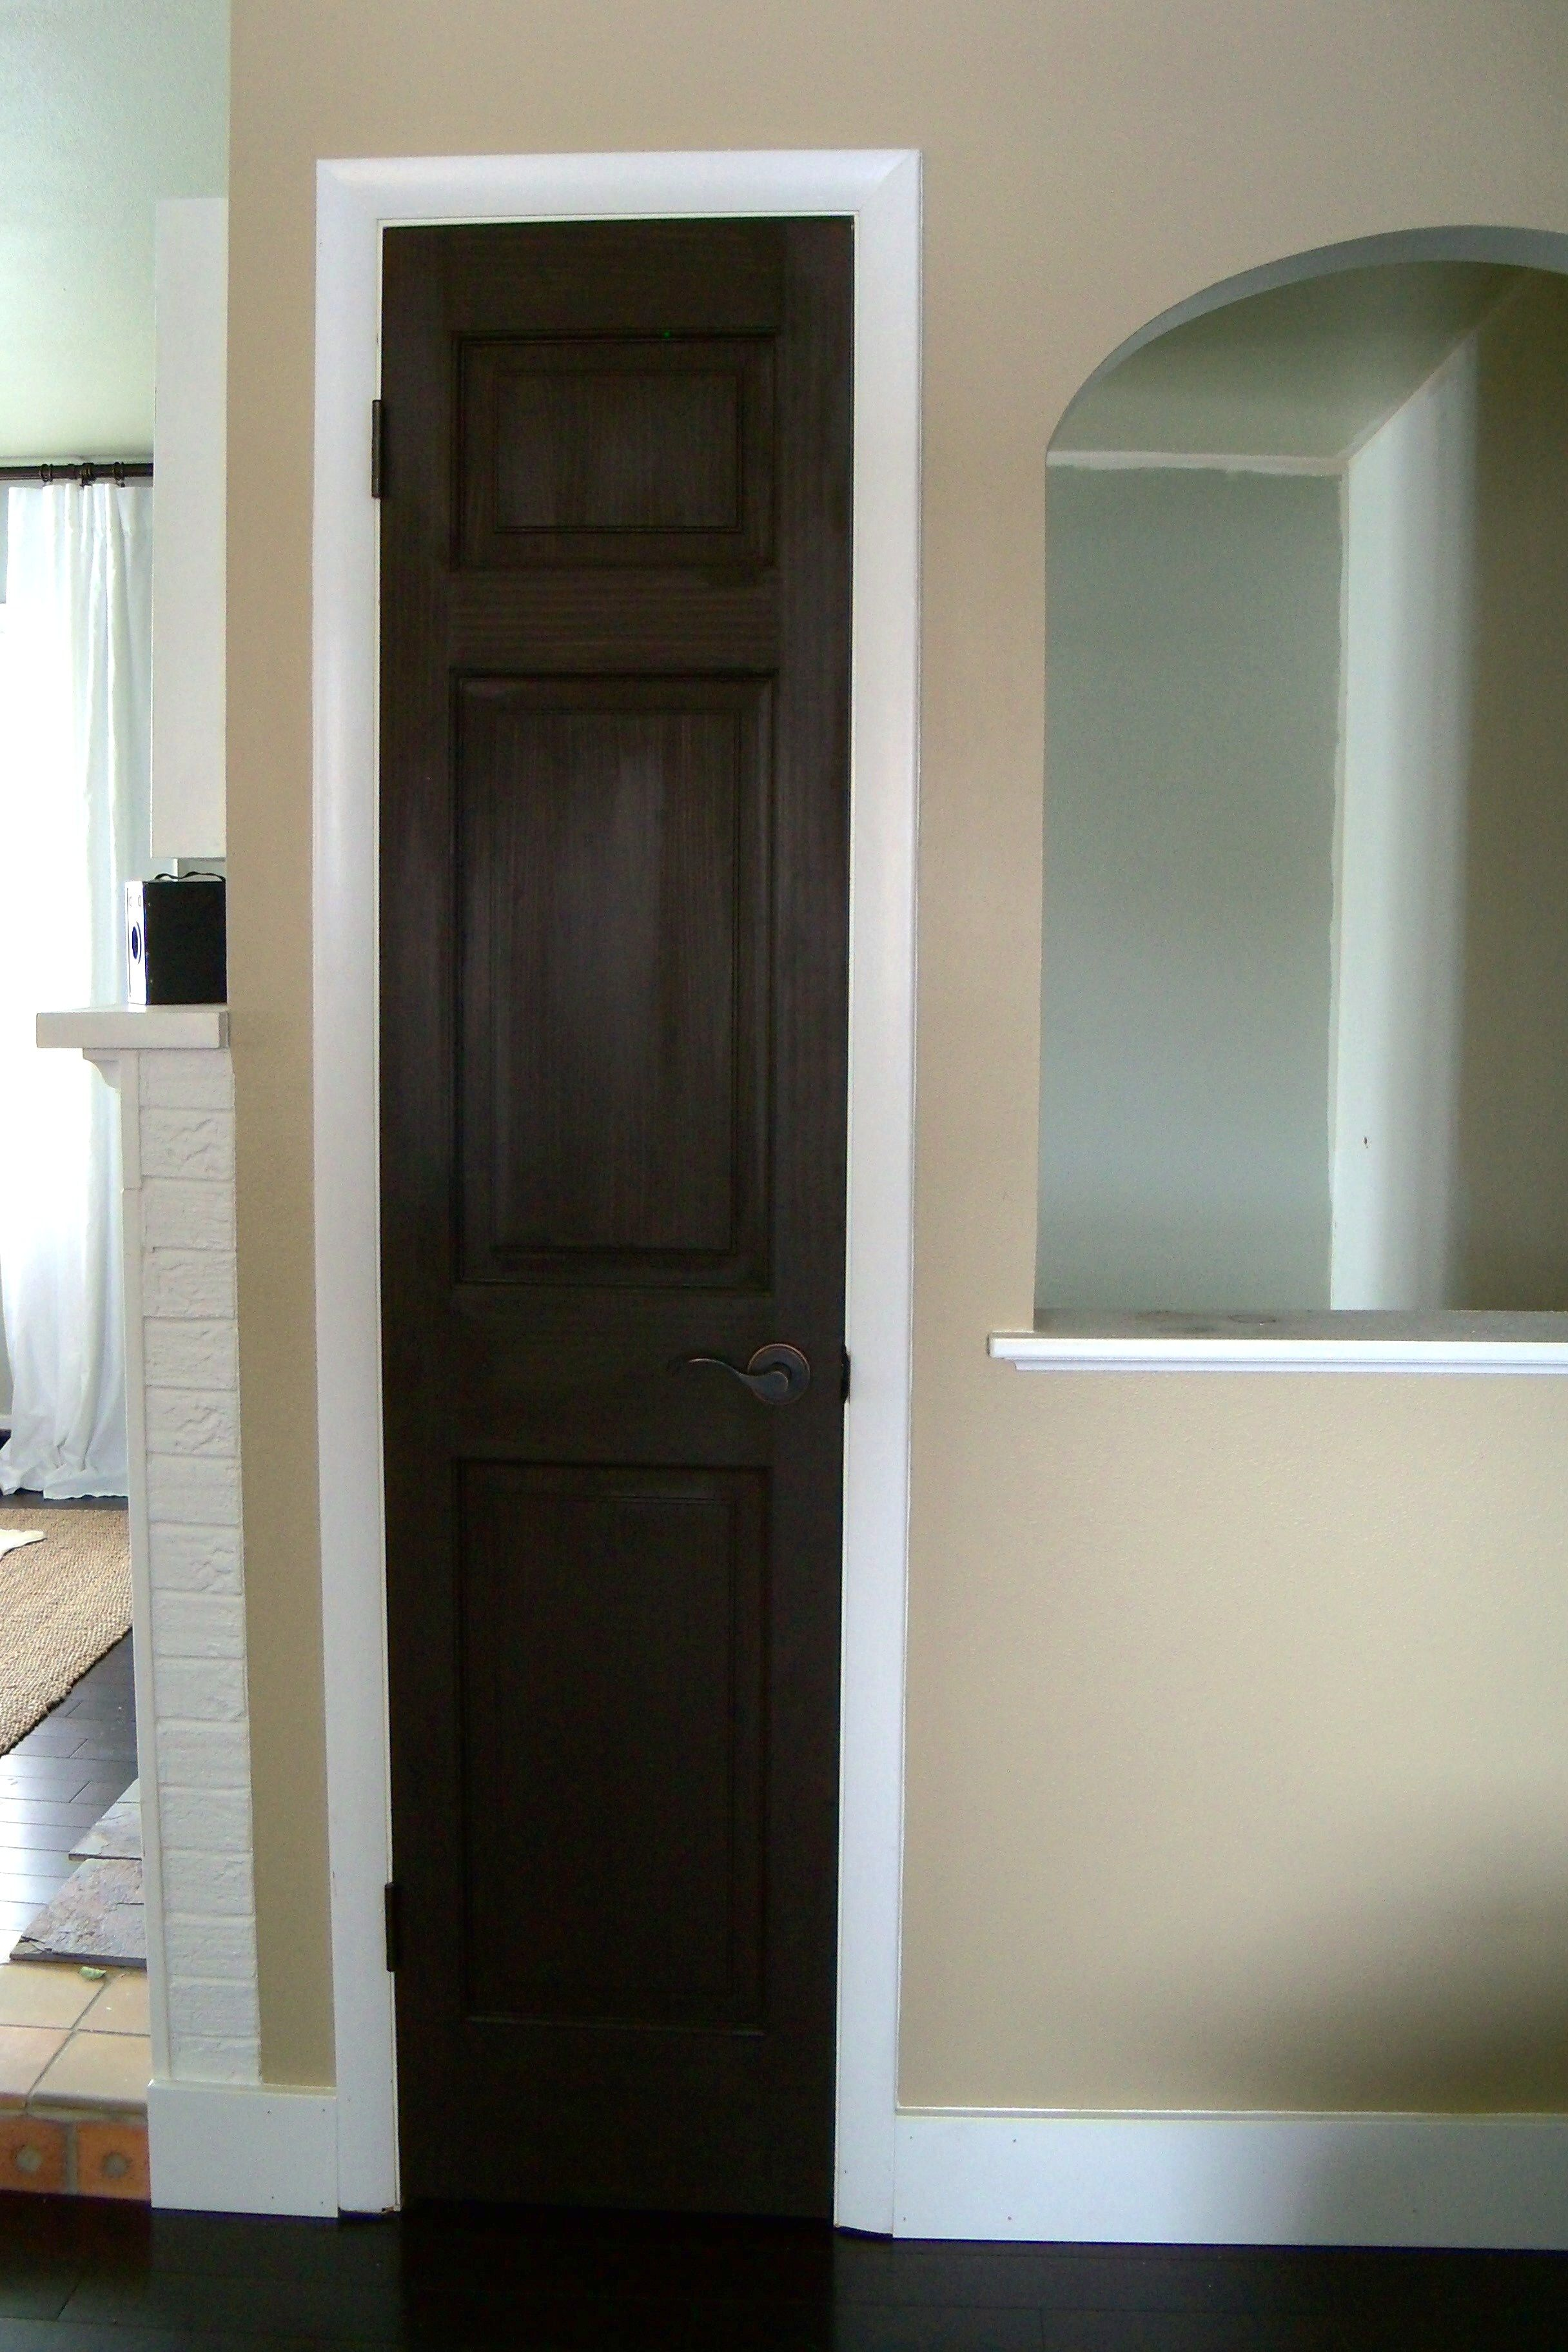 Hallway trim ideas  Stain It Black Interior Doors  Pinterest  Oil rubbed bronze